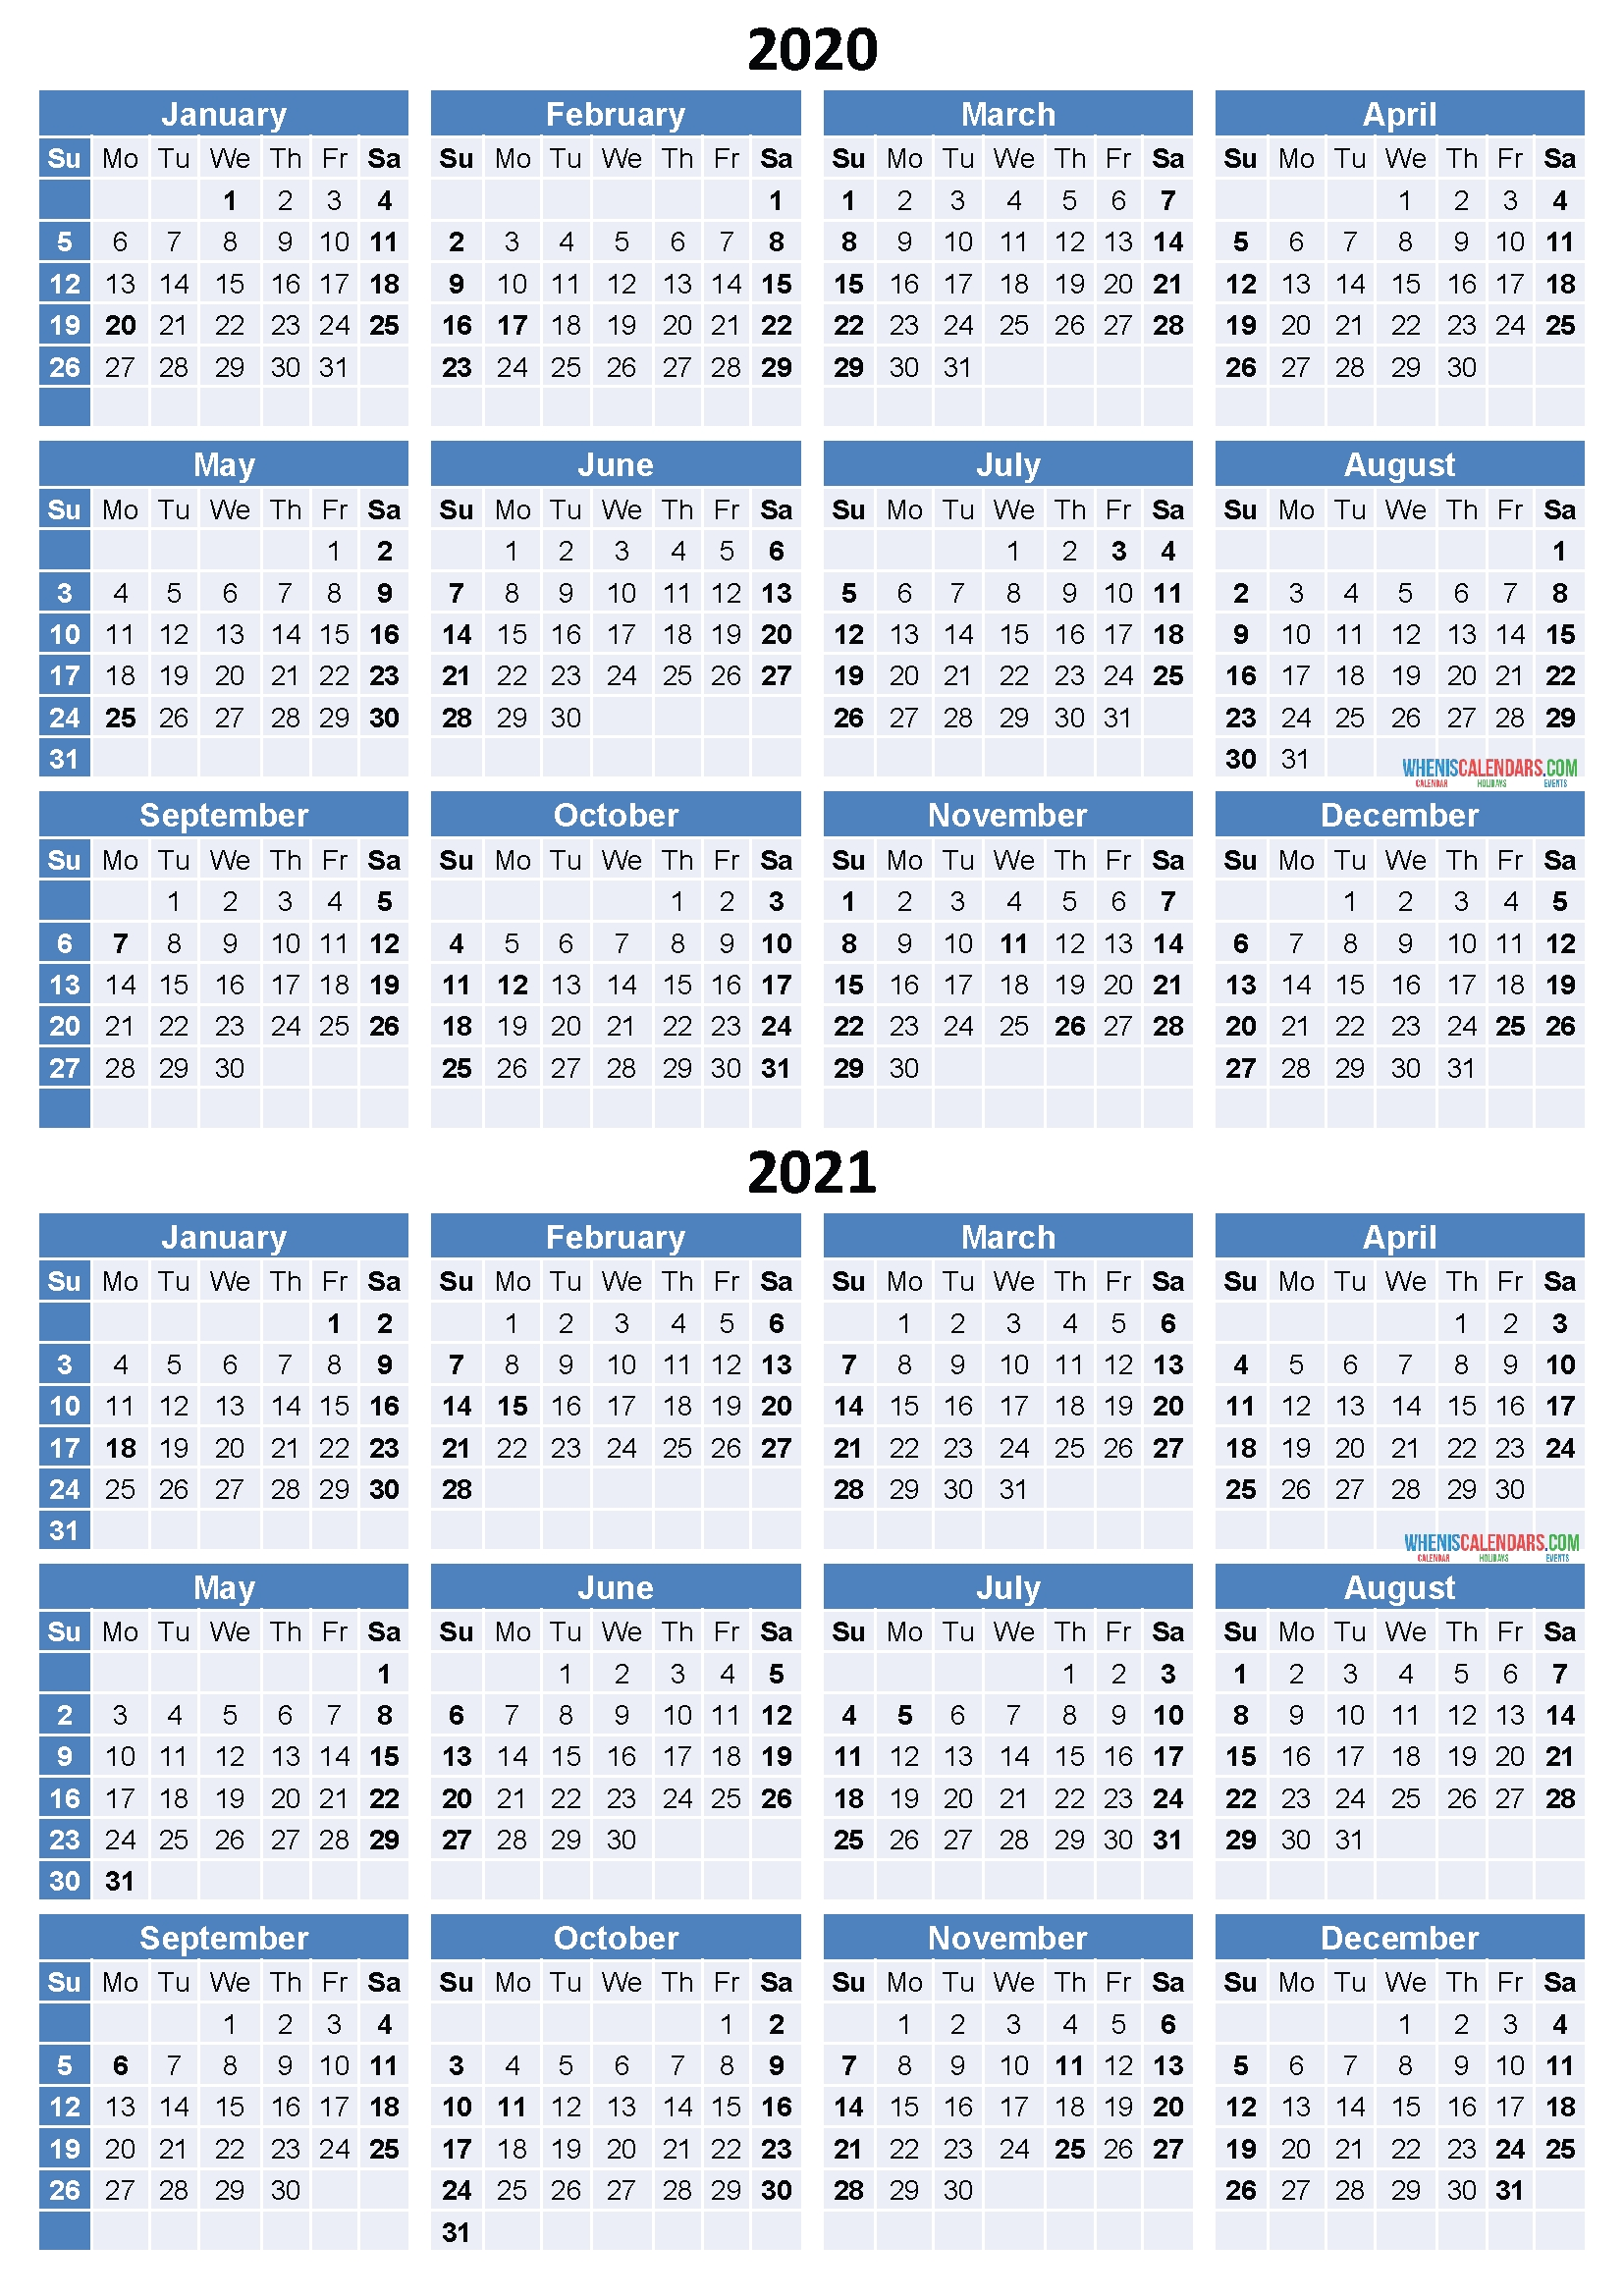 2020 And 2021 Calendar Printable Free Download Word, Pdf Incredible 2 Year Calendar 2020 And 2021